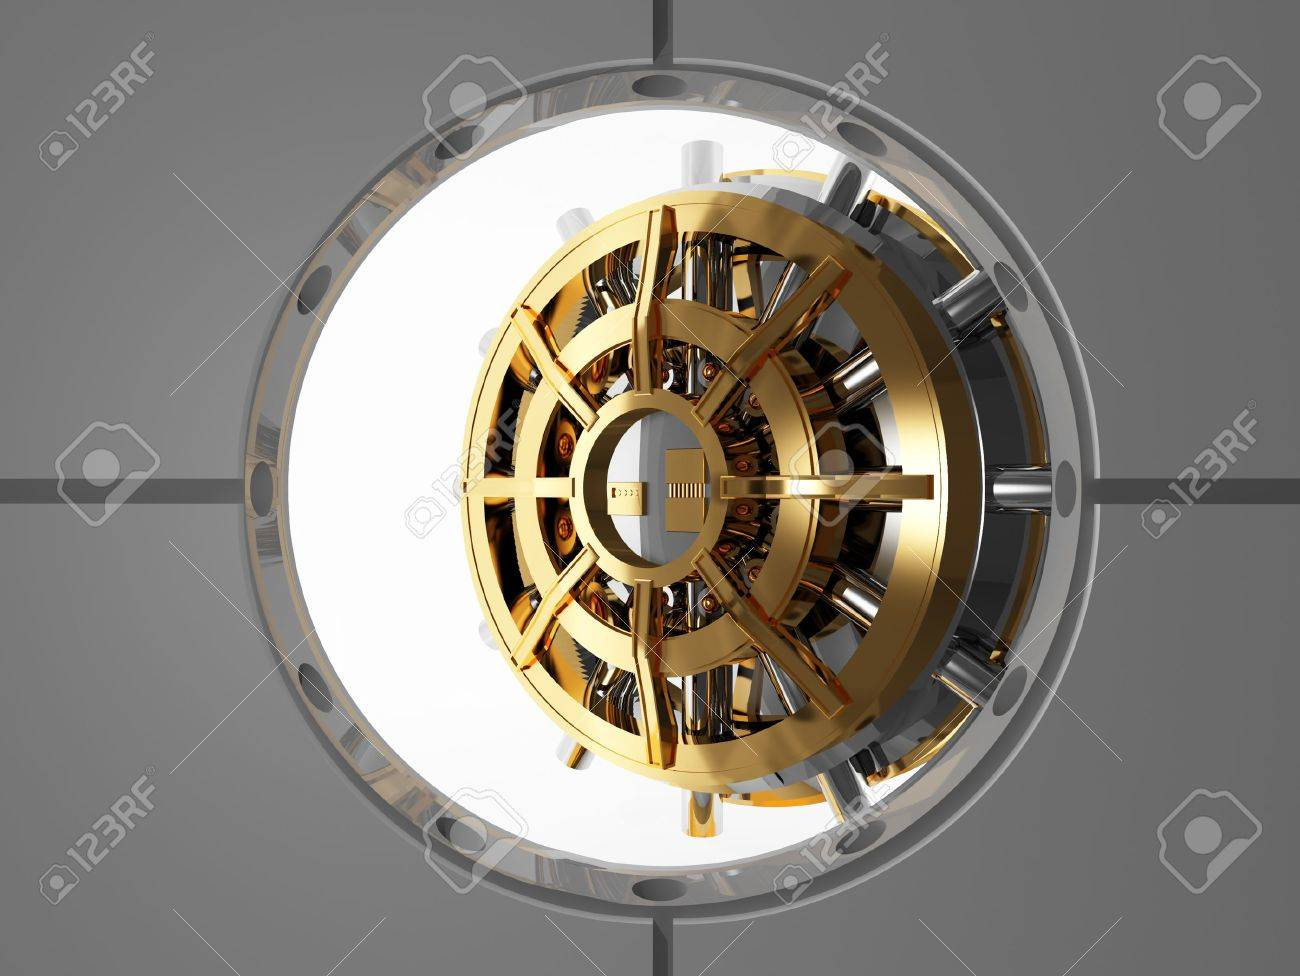 bank vault door 3d view from safety room Stock Photo - 6829834